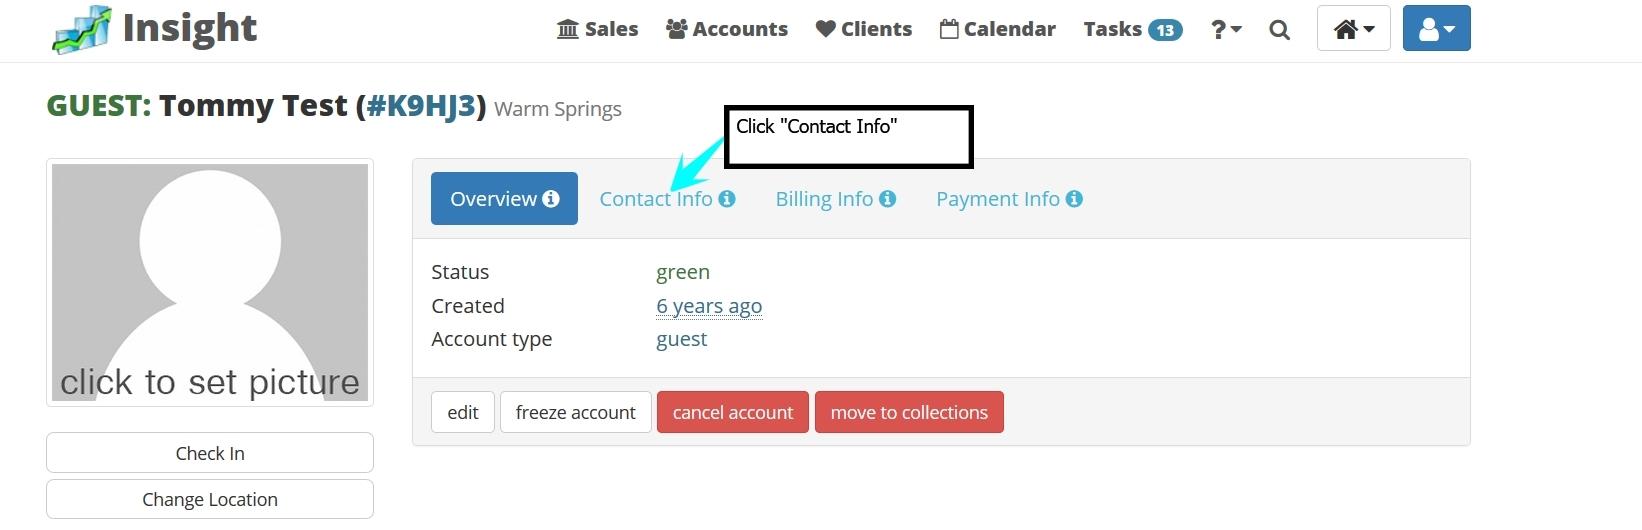 contact_info_click.png